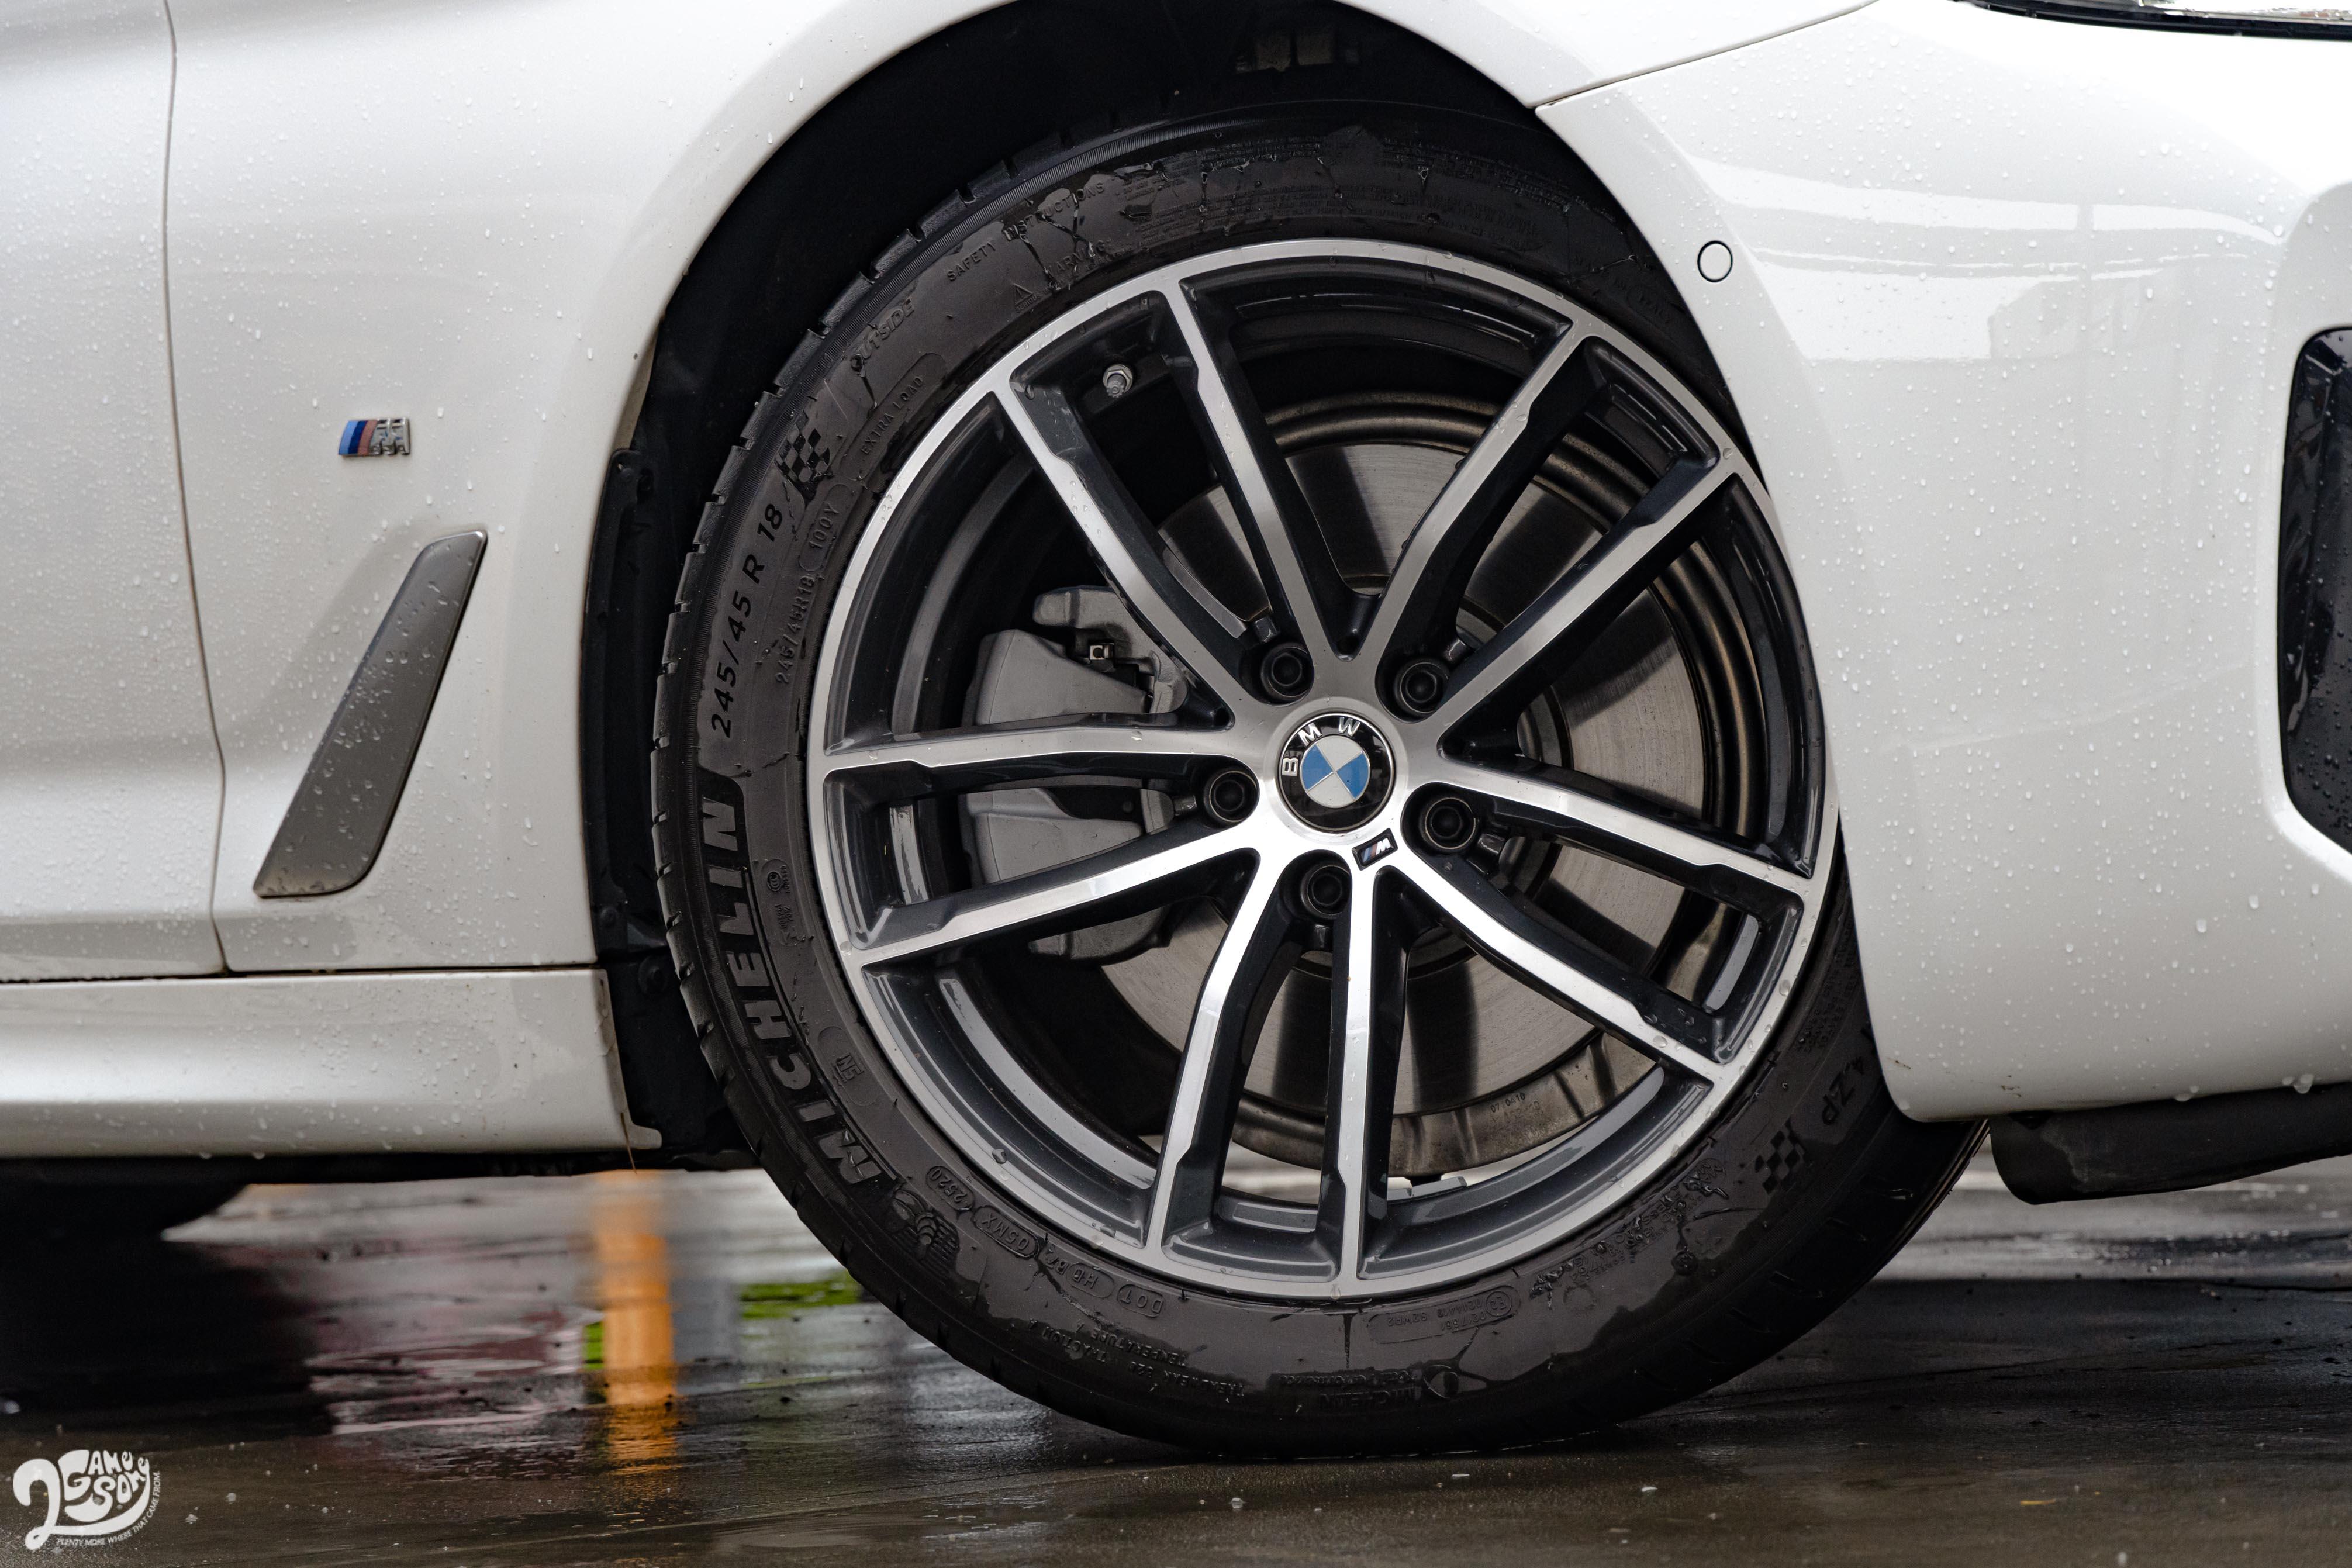 520i M Sport 標配 18 吋輪圈。